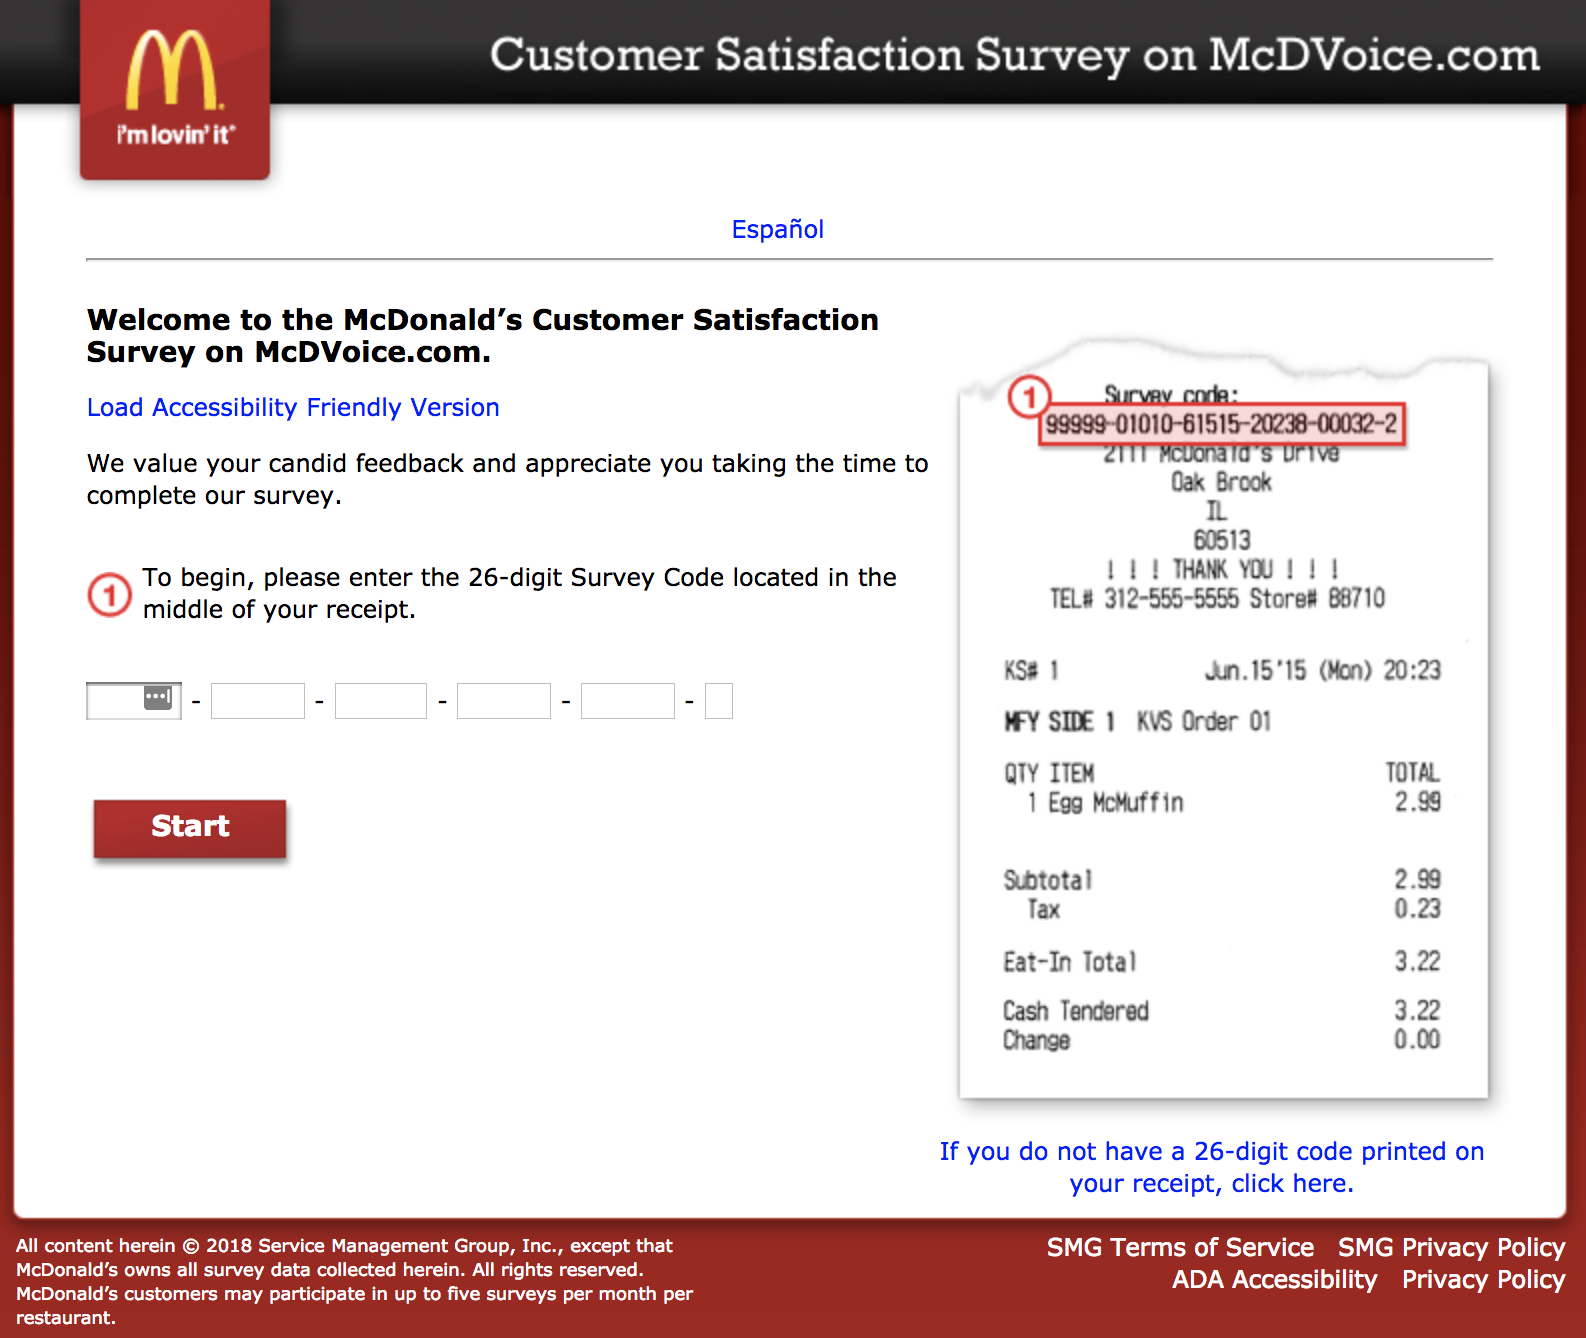 MCDVoice Customer Survey from McDonald WWW MCDvoice COM